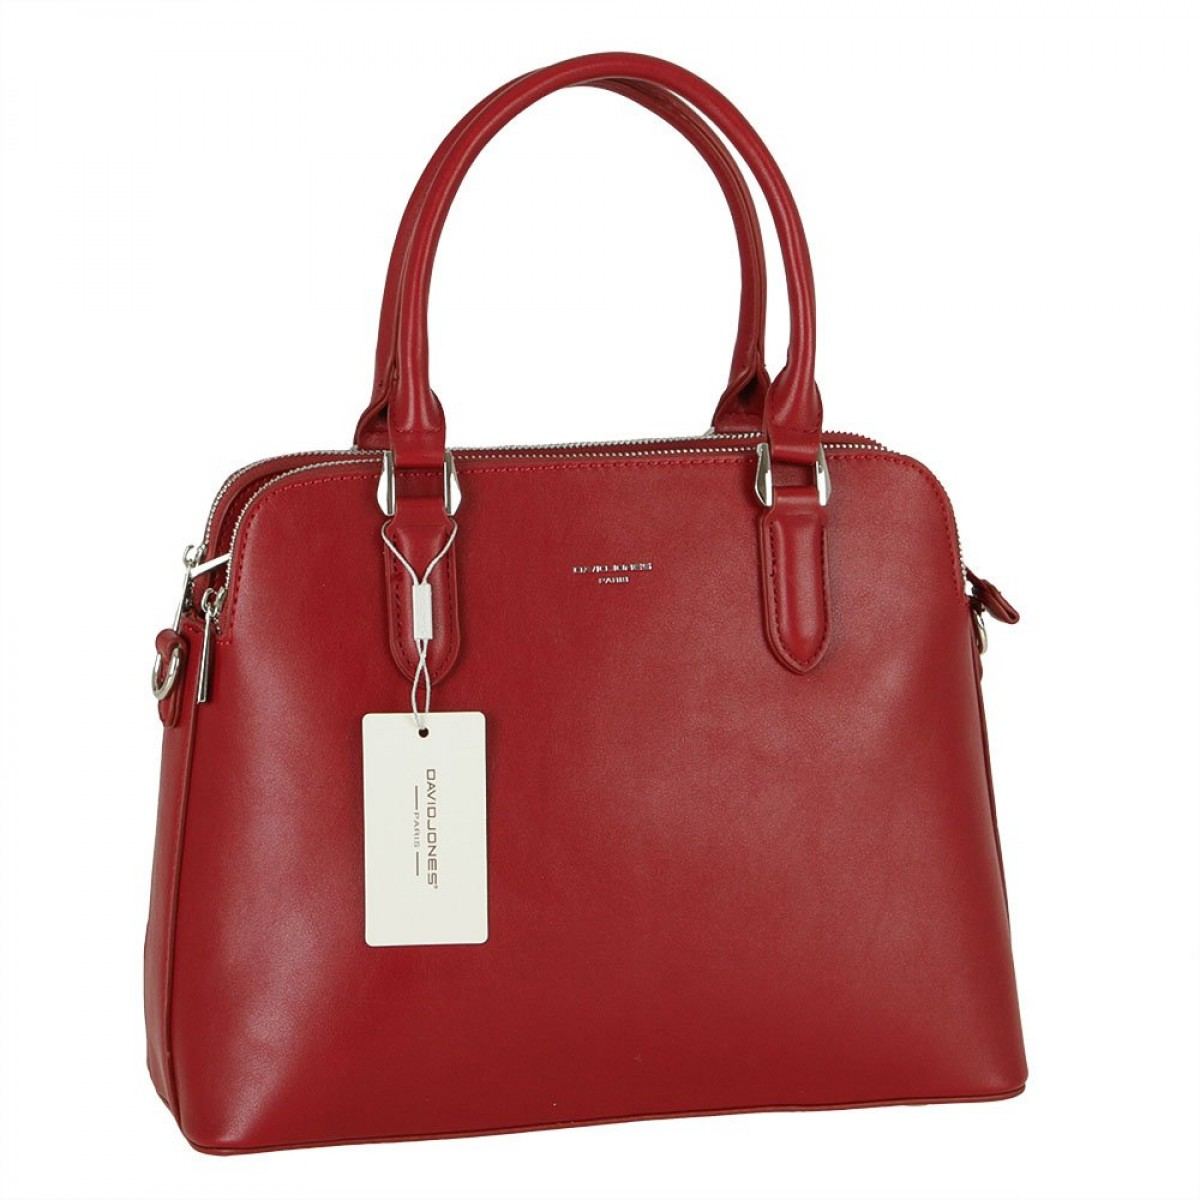 Жіноча сумка David Jones 6407-2 DARK RED